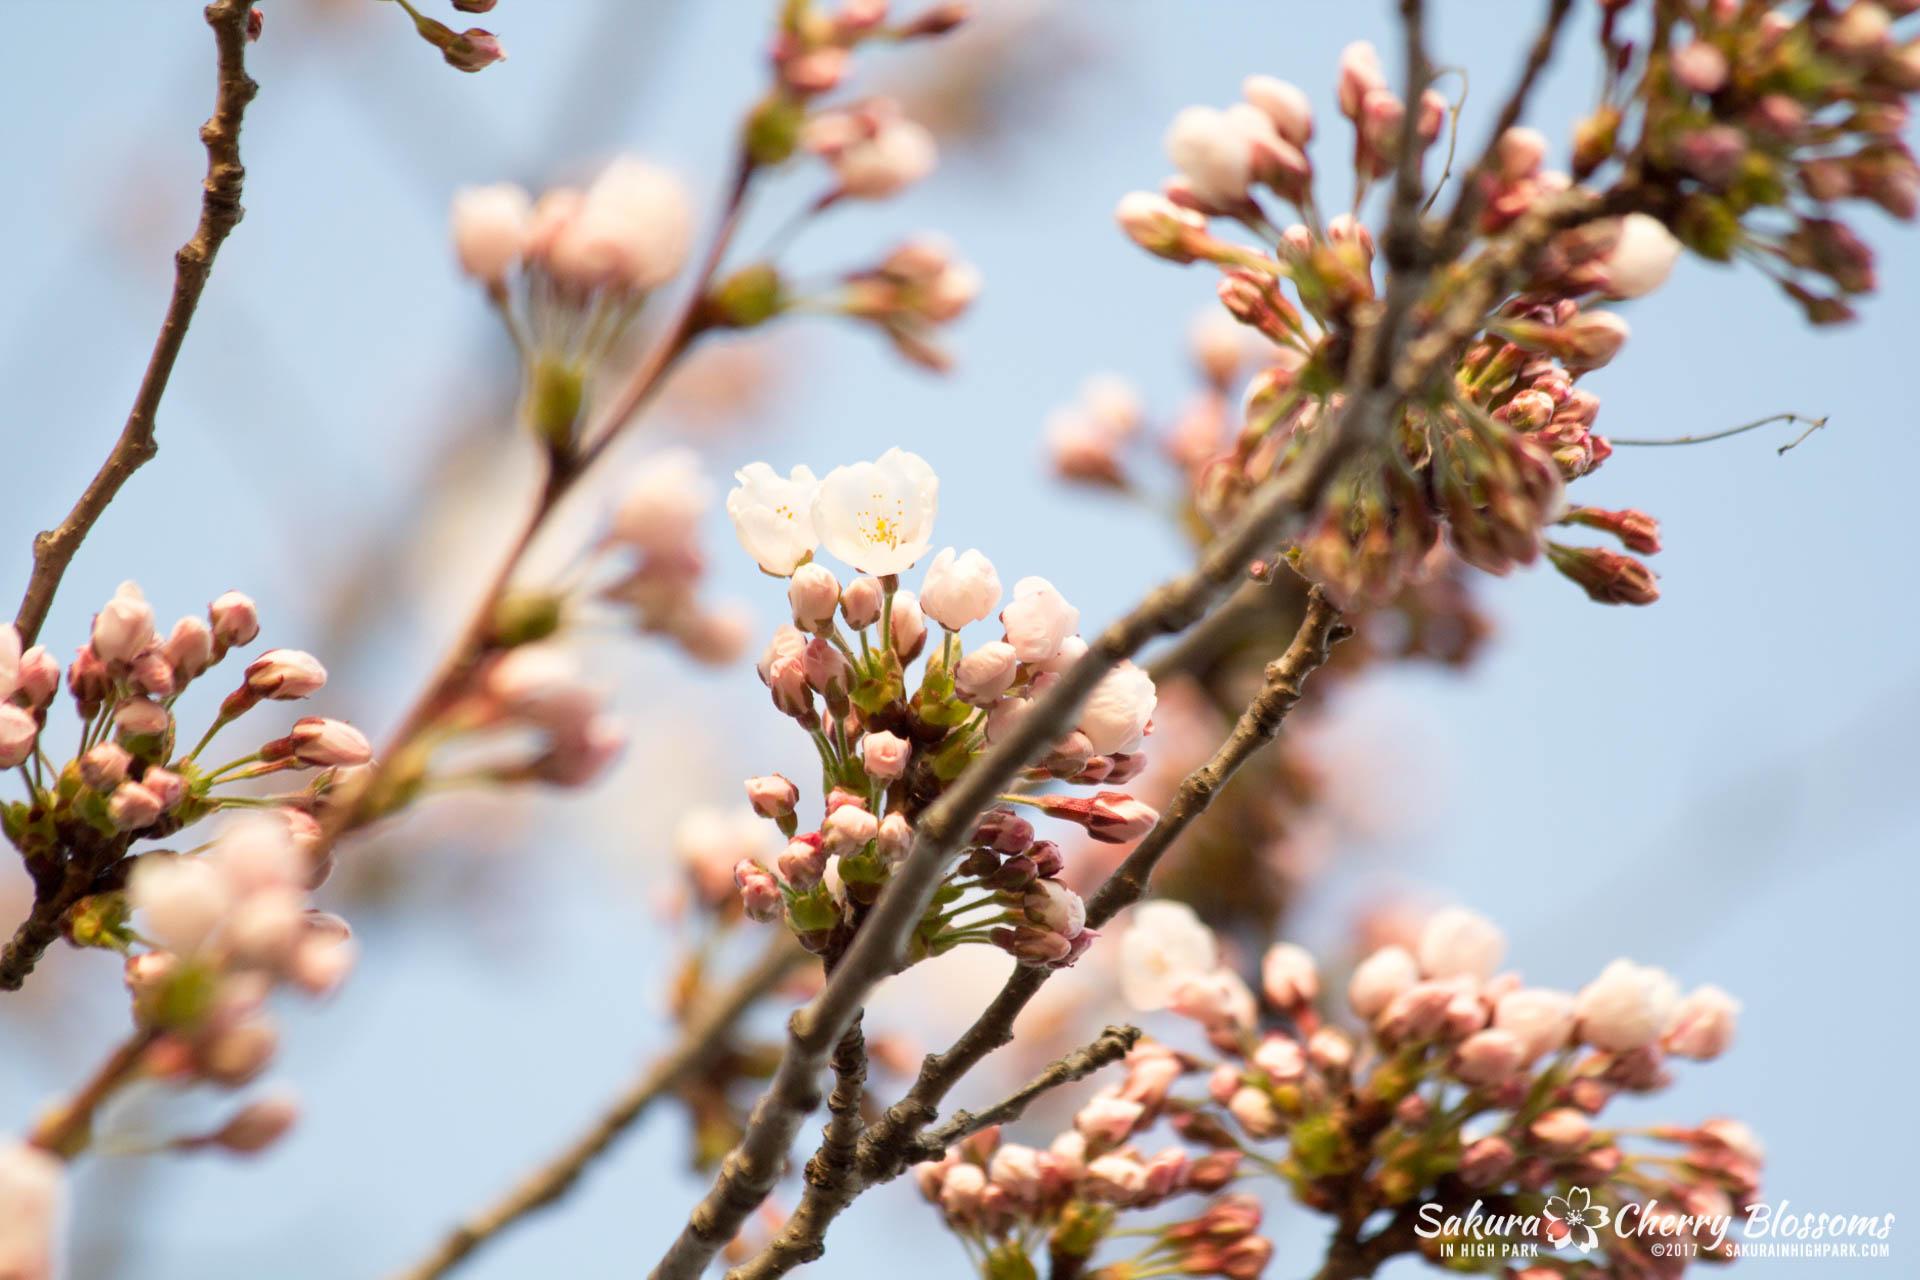 Sakura-Watch-April-24-2017-bloom-has-begun-with-more-to-come-66.jpg